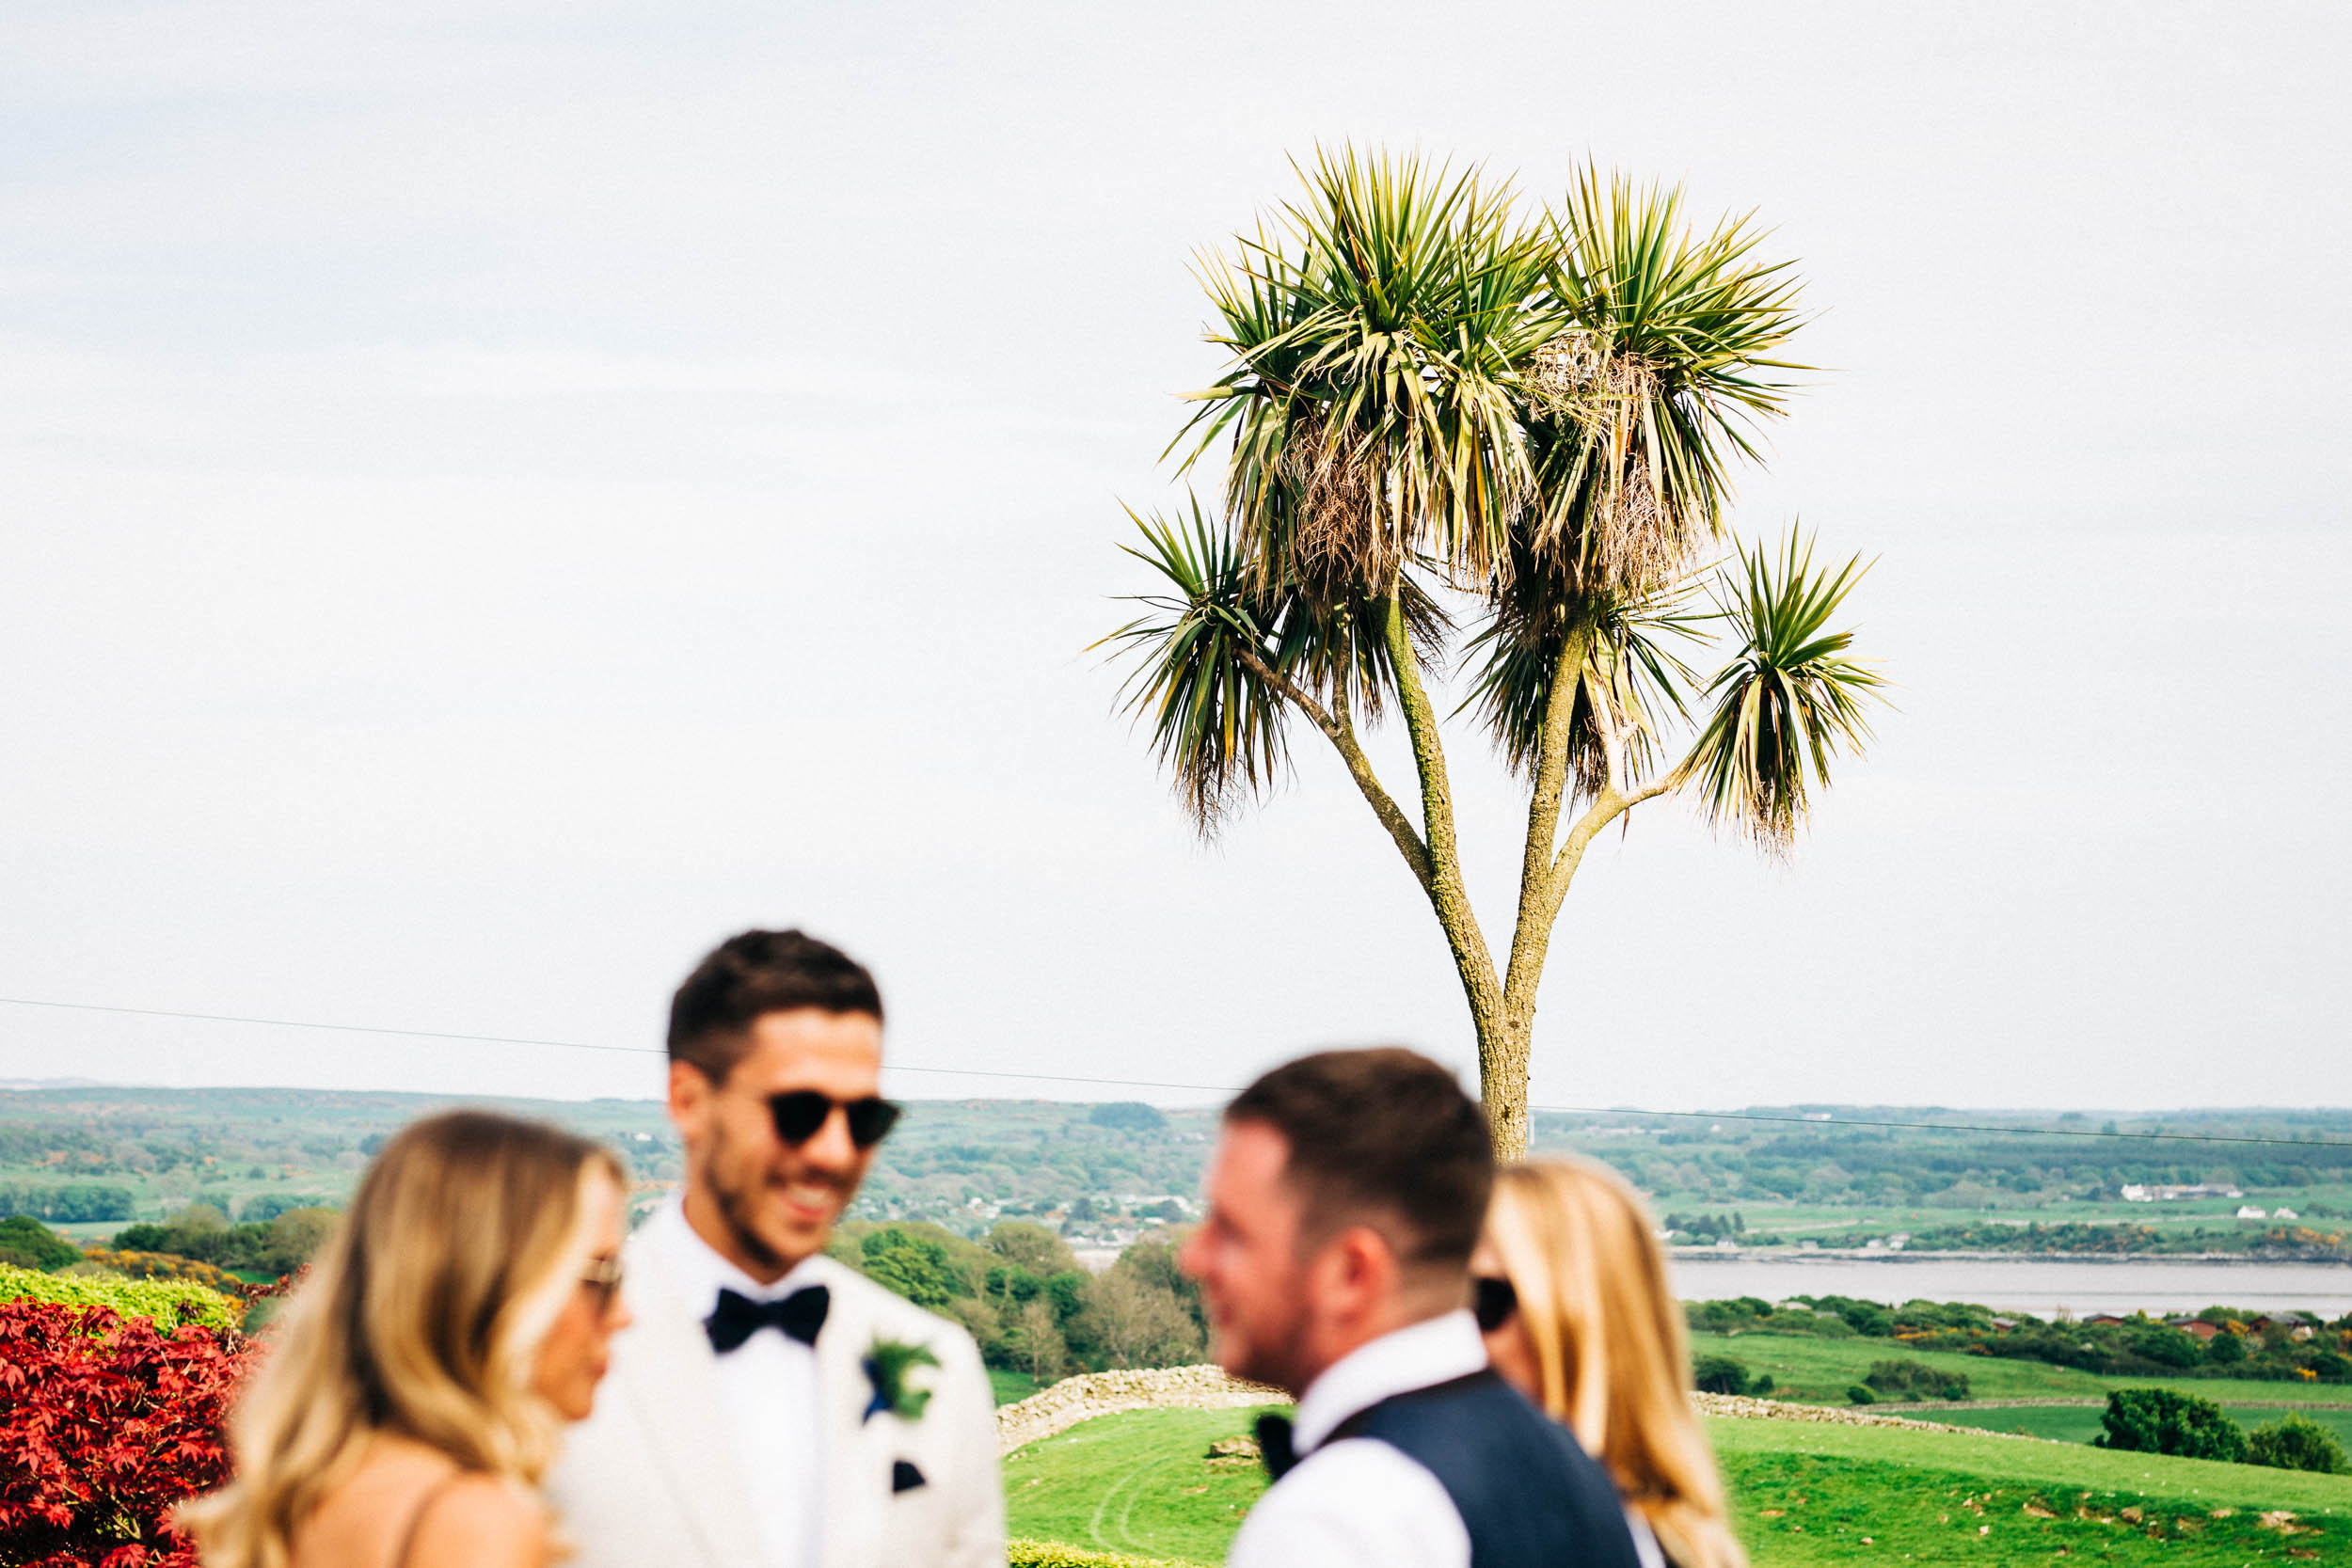 Alex_Sedgmond_Photography-SouthWalesWeddingPhotography-Wedding-Photographer-Cardiff-86.jpg